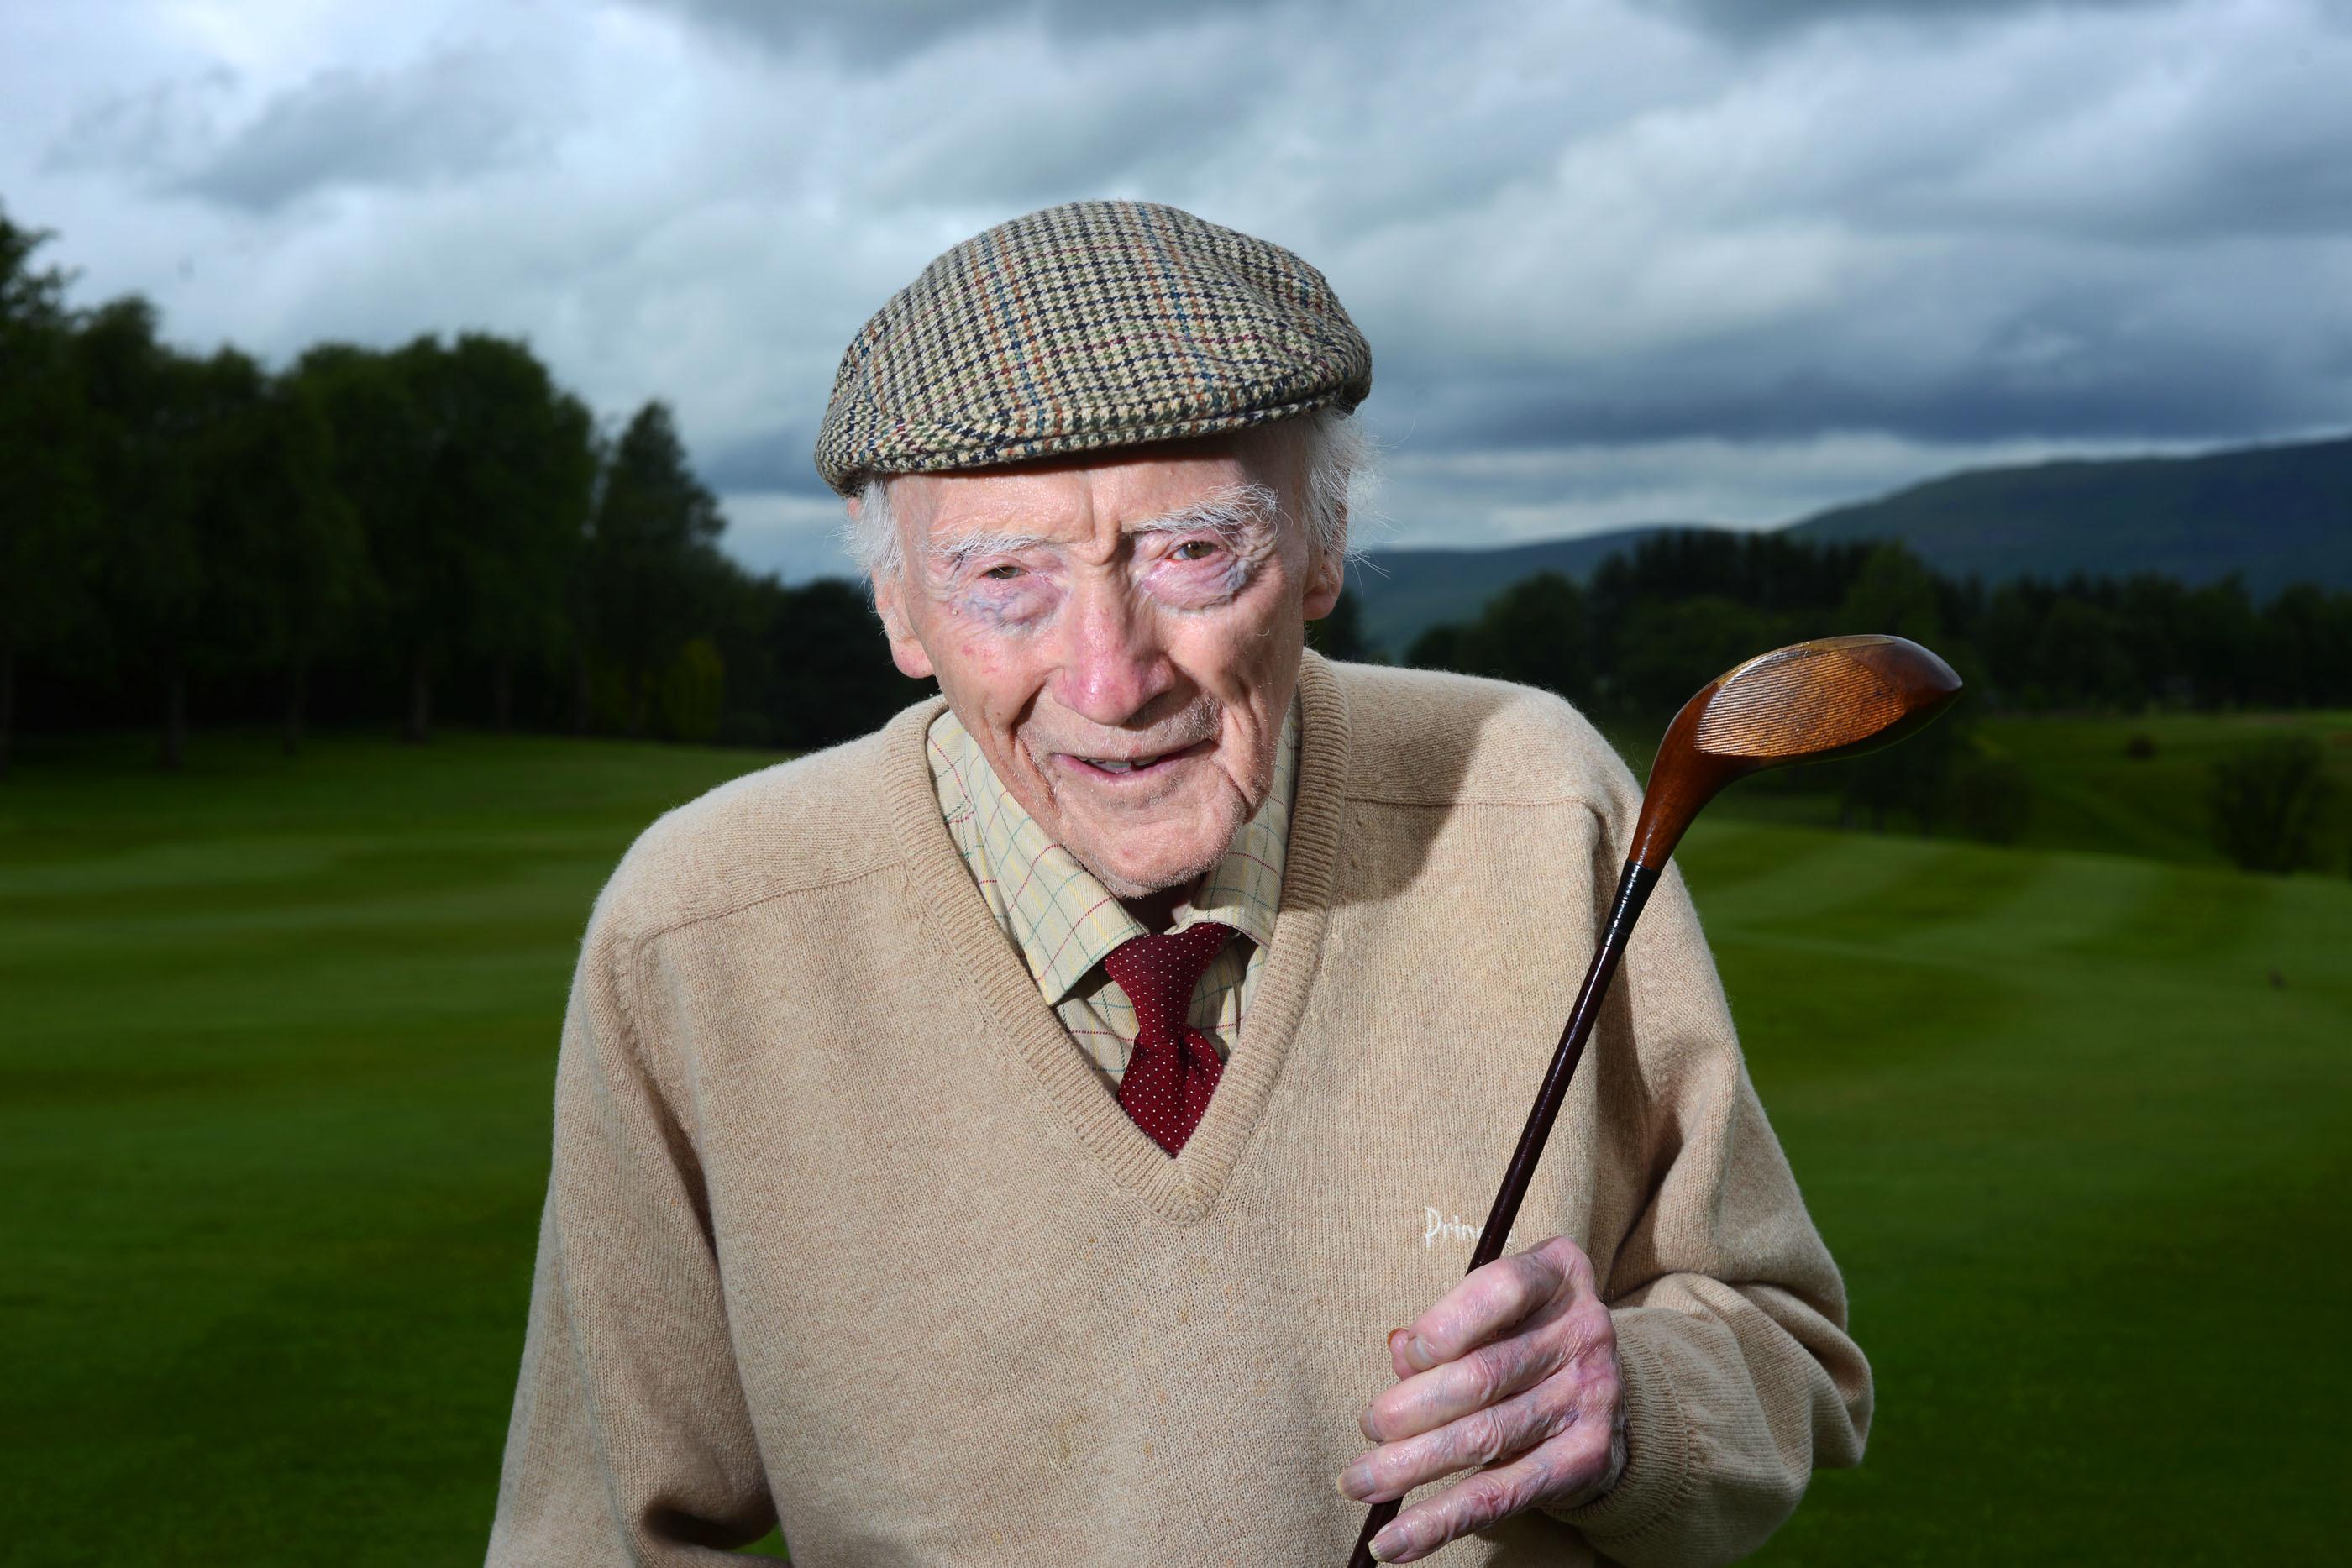 Willie Cuthbert, aged 102, from Kirkintilloch (SWNS / Stuart Maxwell)